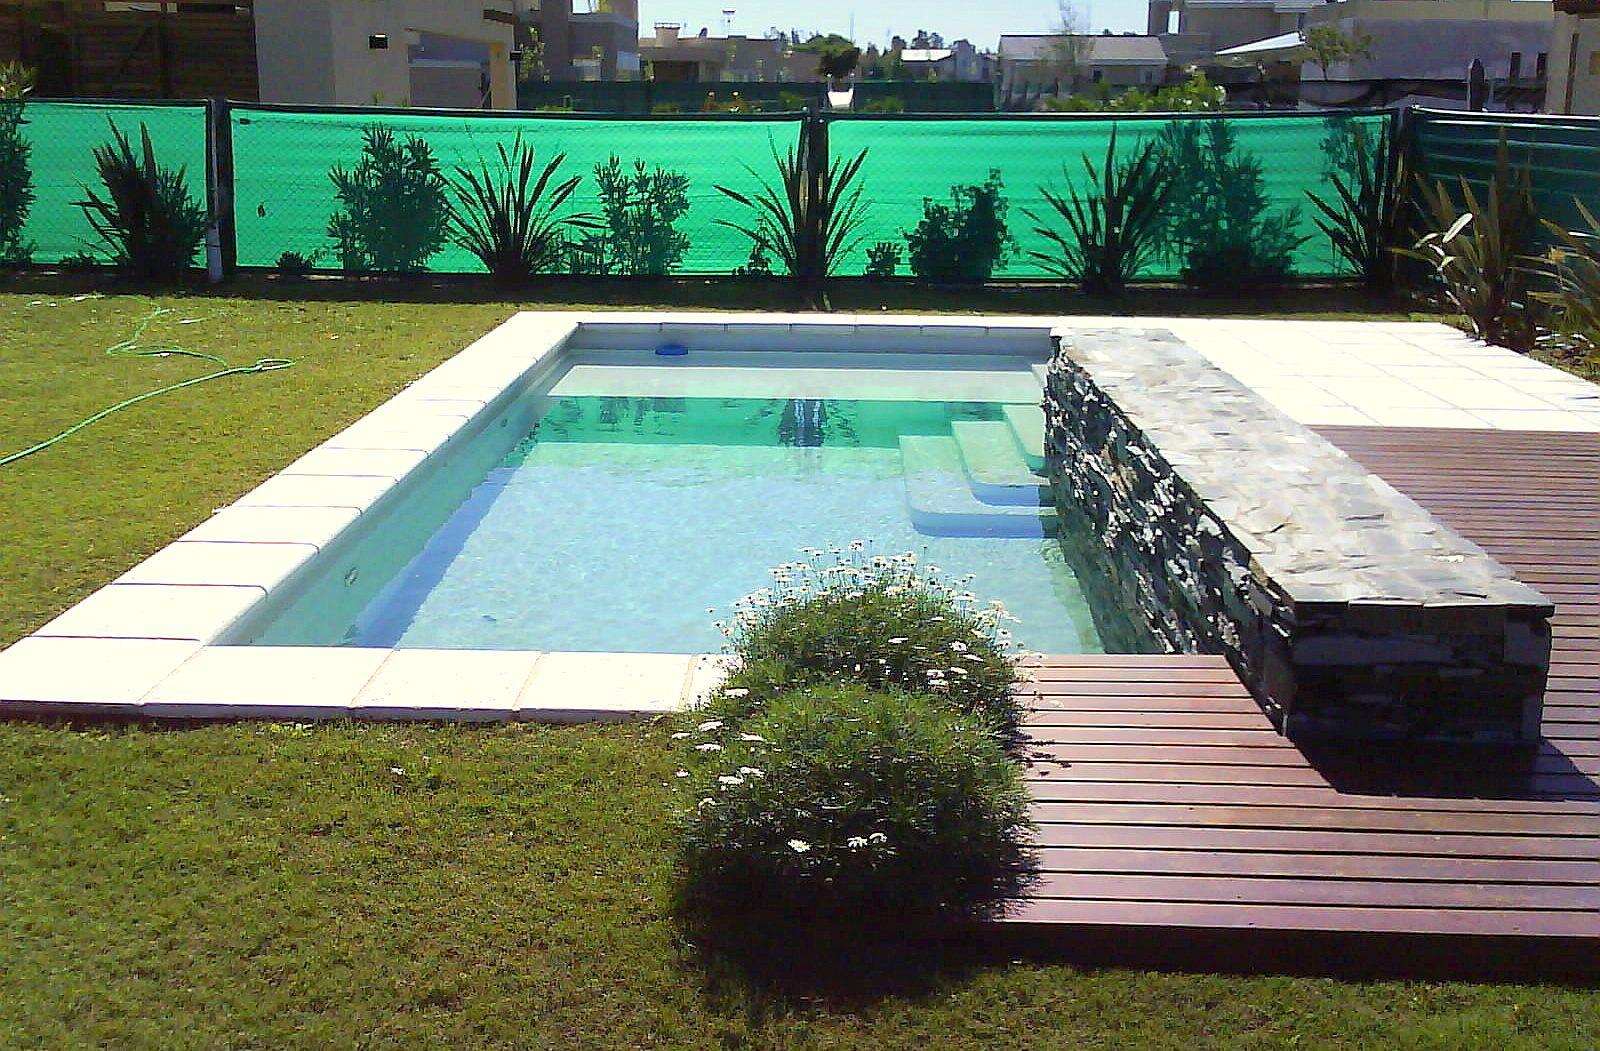 Dise o personalizados canteros revestidos en piedra deck - Diseno de piscinas ...